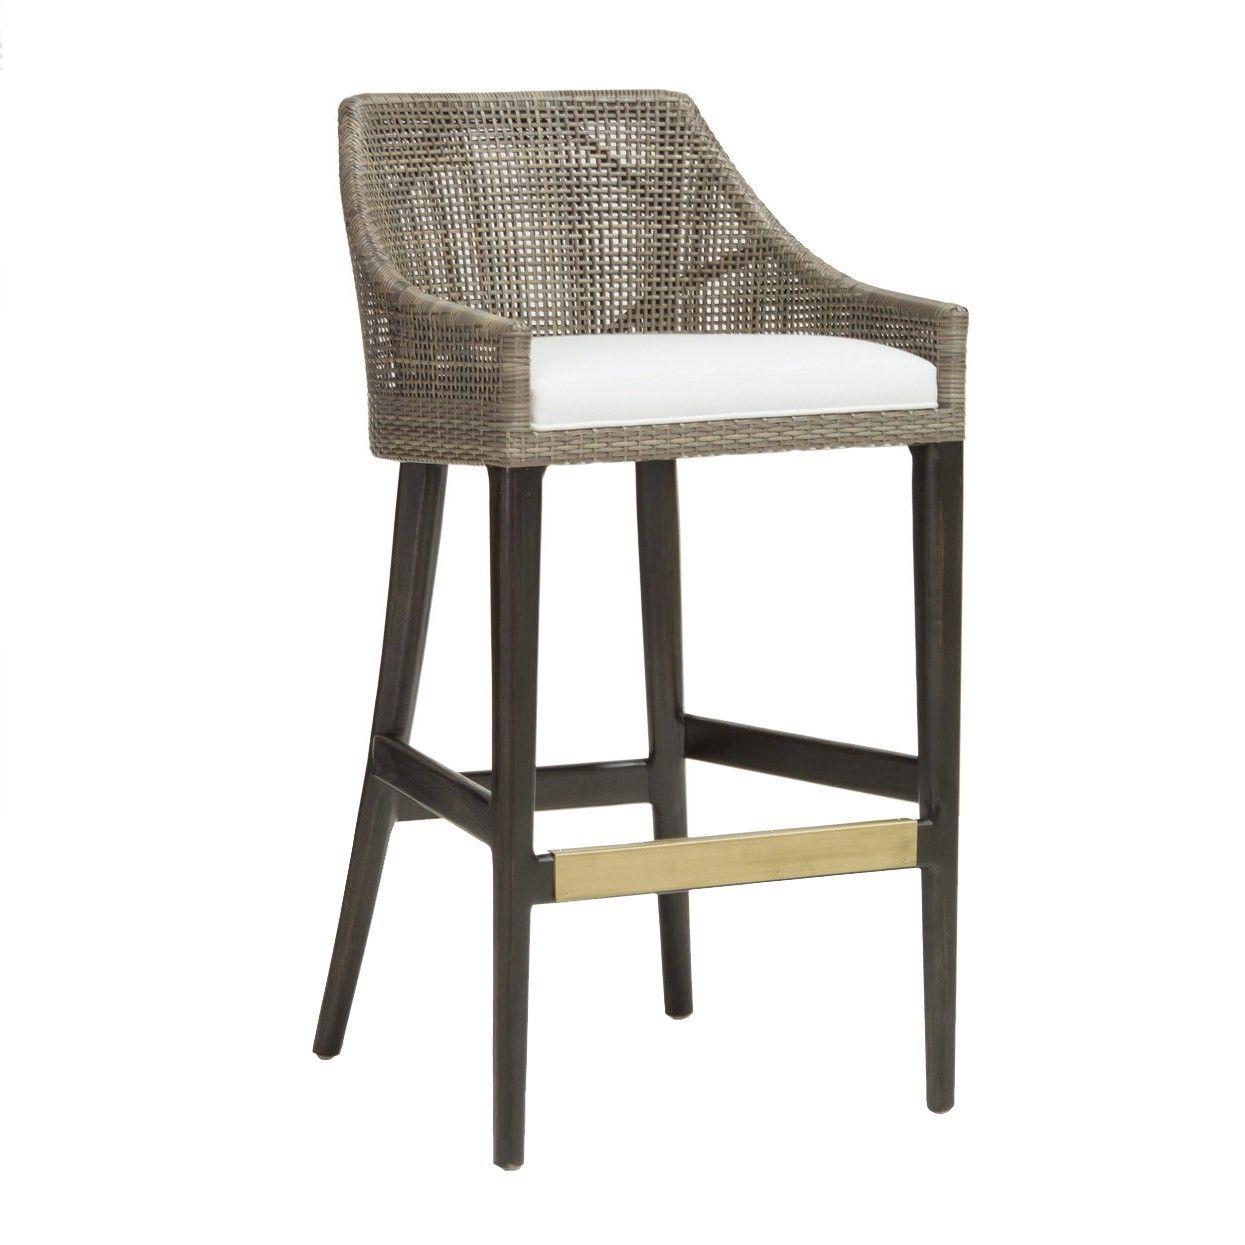 Chair Cba Steel Design Plastic Palecek 43vincent 43stool 43 43hardwood 43frame 43and 43legs 43in 43black